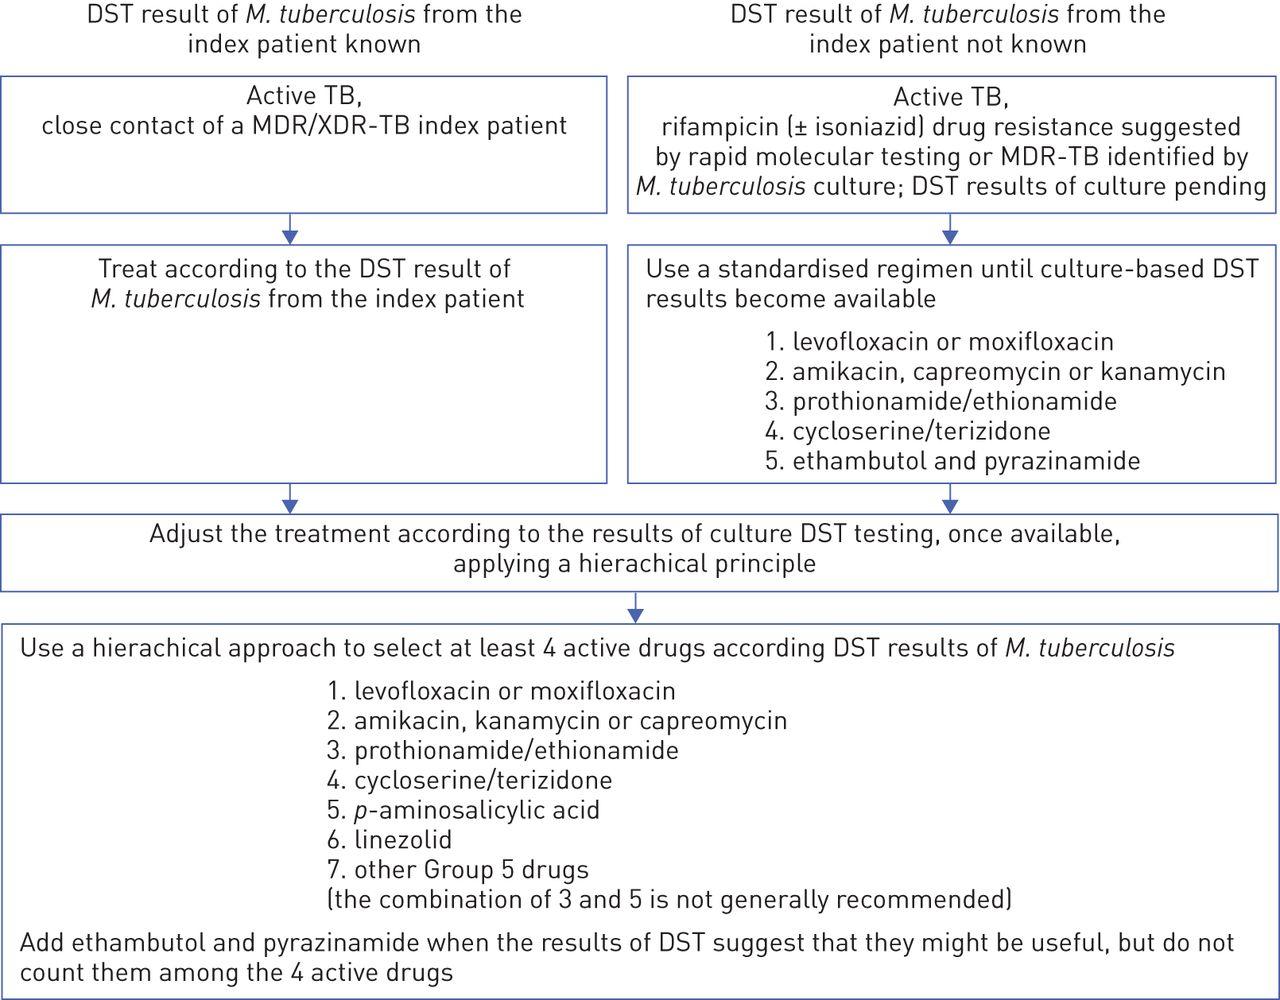 management of patients with multidrug-resistant/extensively drug